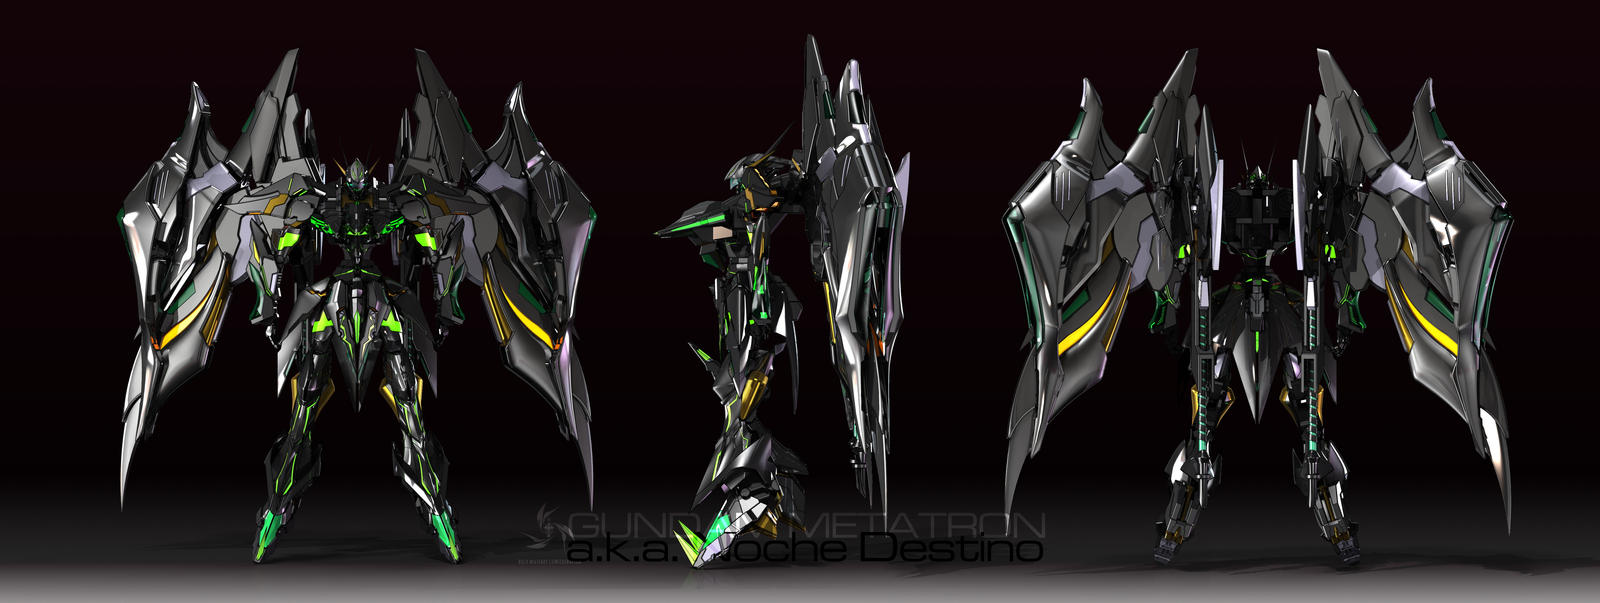 Gundam Metatron by masarebelth